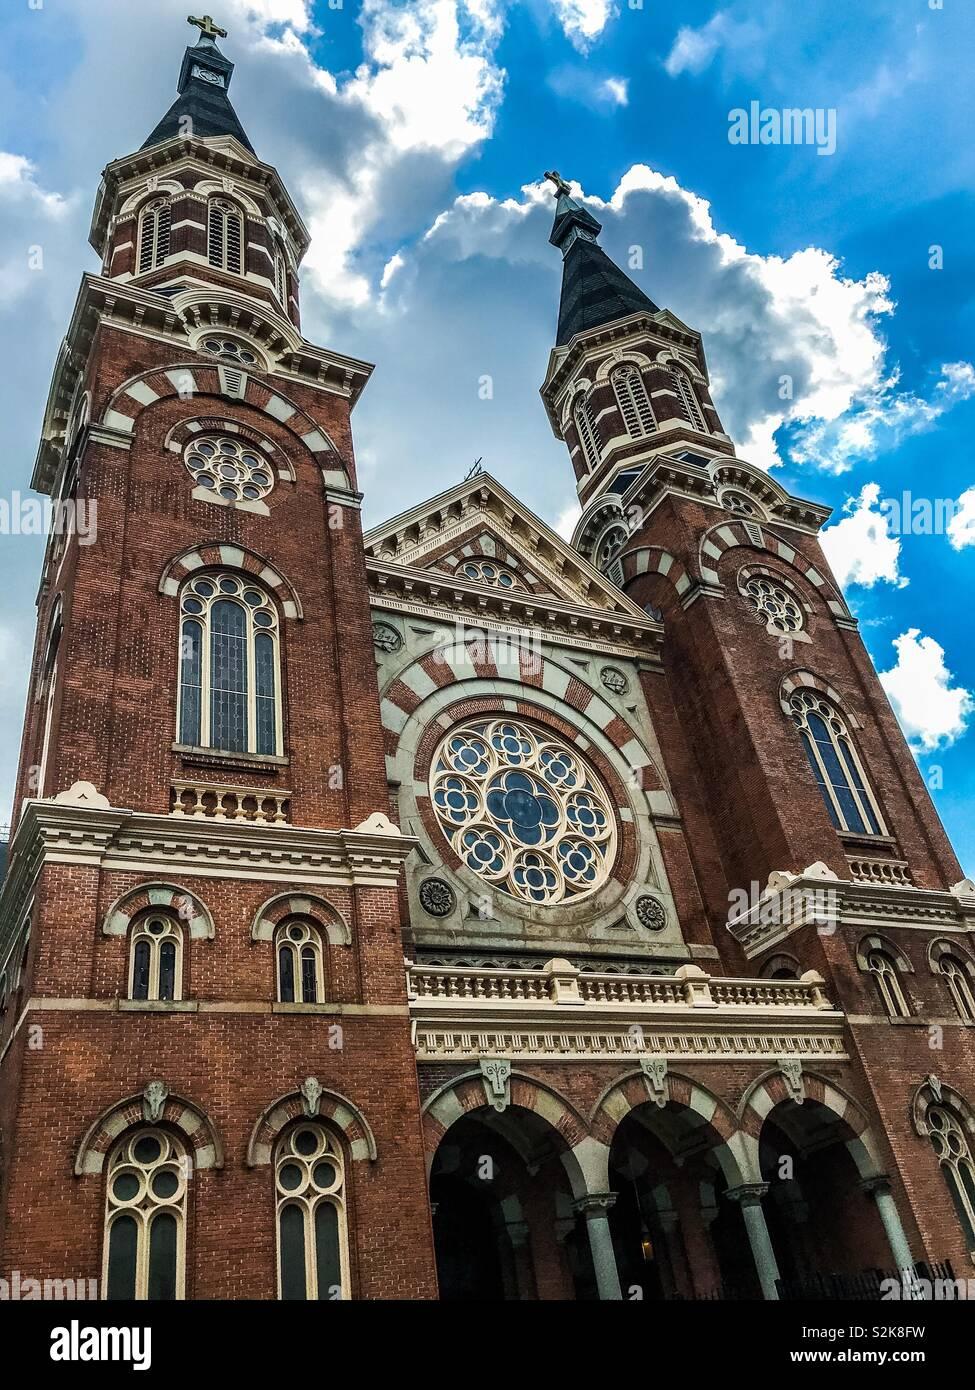 Facade of St. Mary's Catholic Church, 1884-1885, in Greektown, Detroit, Michigan, USA. Romanesque Revival; Neo-Romanesque. Photo Credit: Ann M. Nicgorski, 2018. - Stock Image